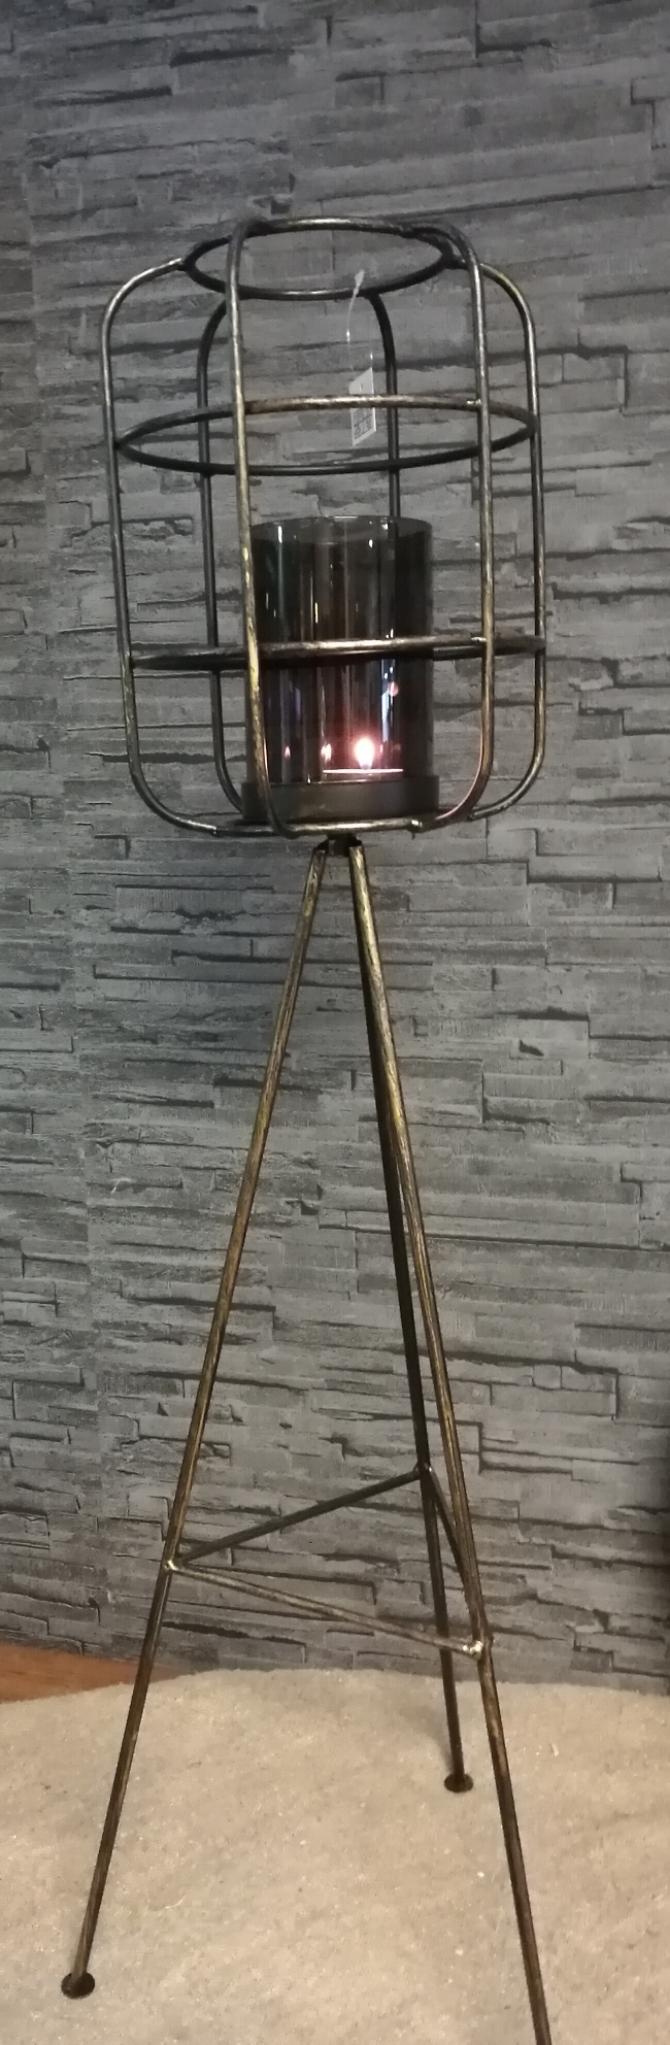 Lantaarn metaal,driepoot 01889